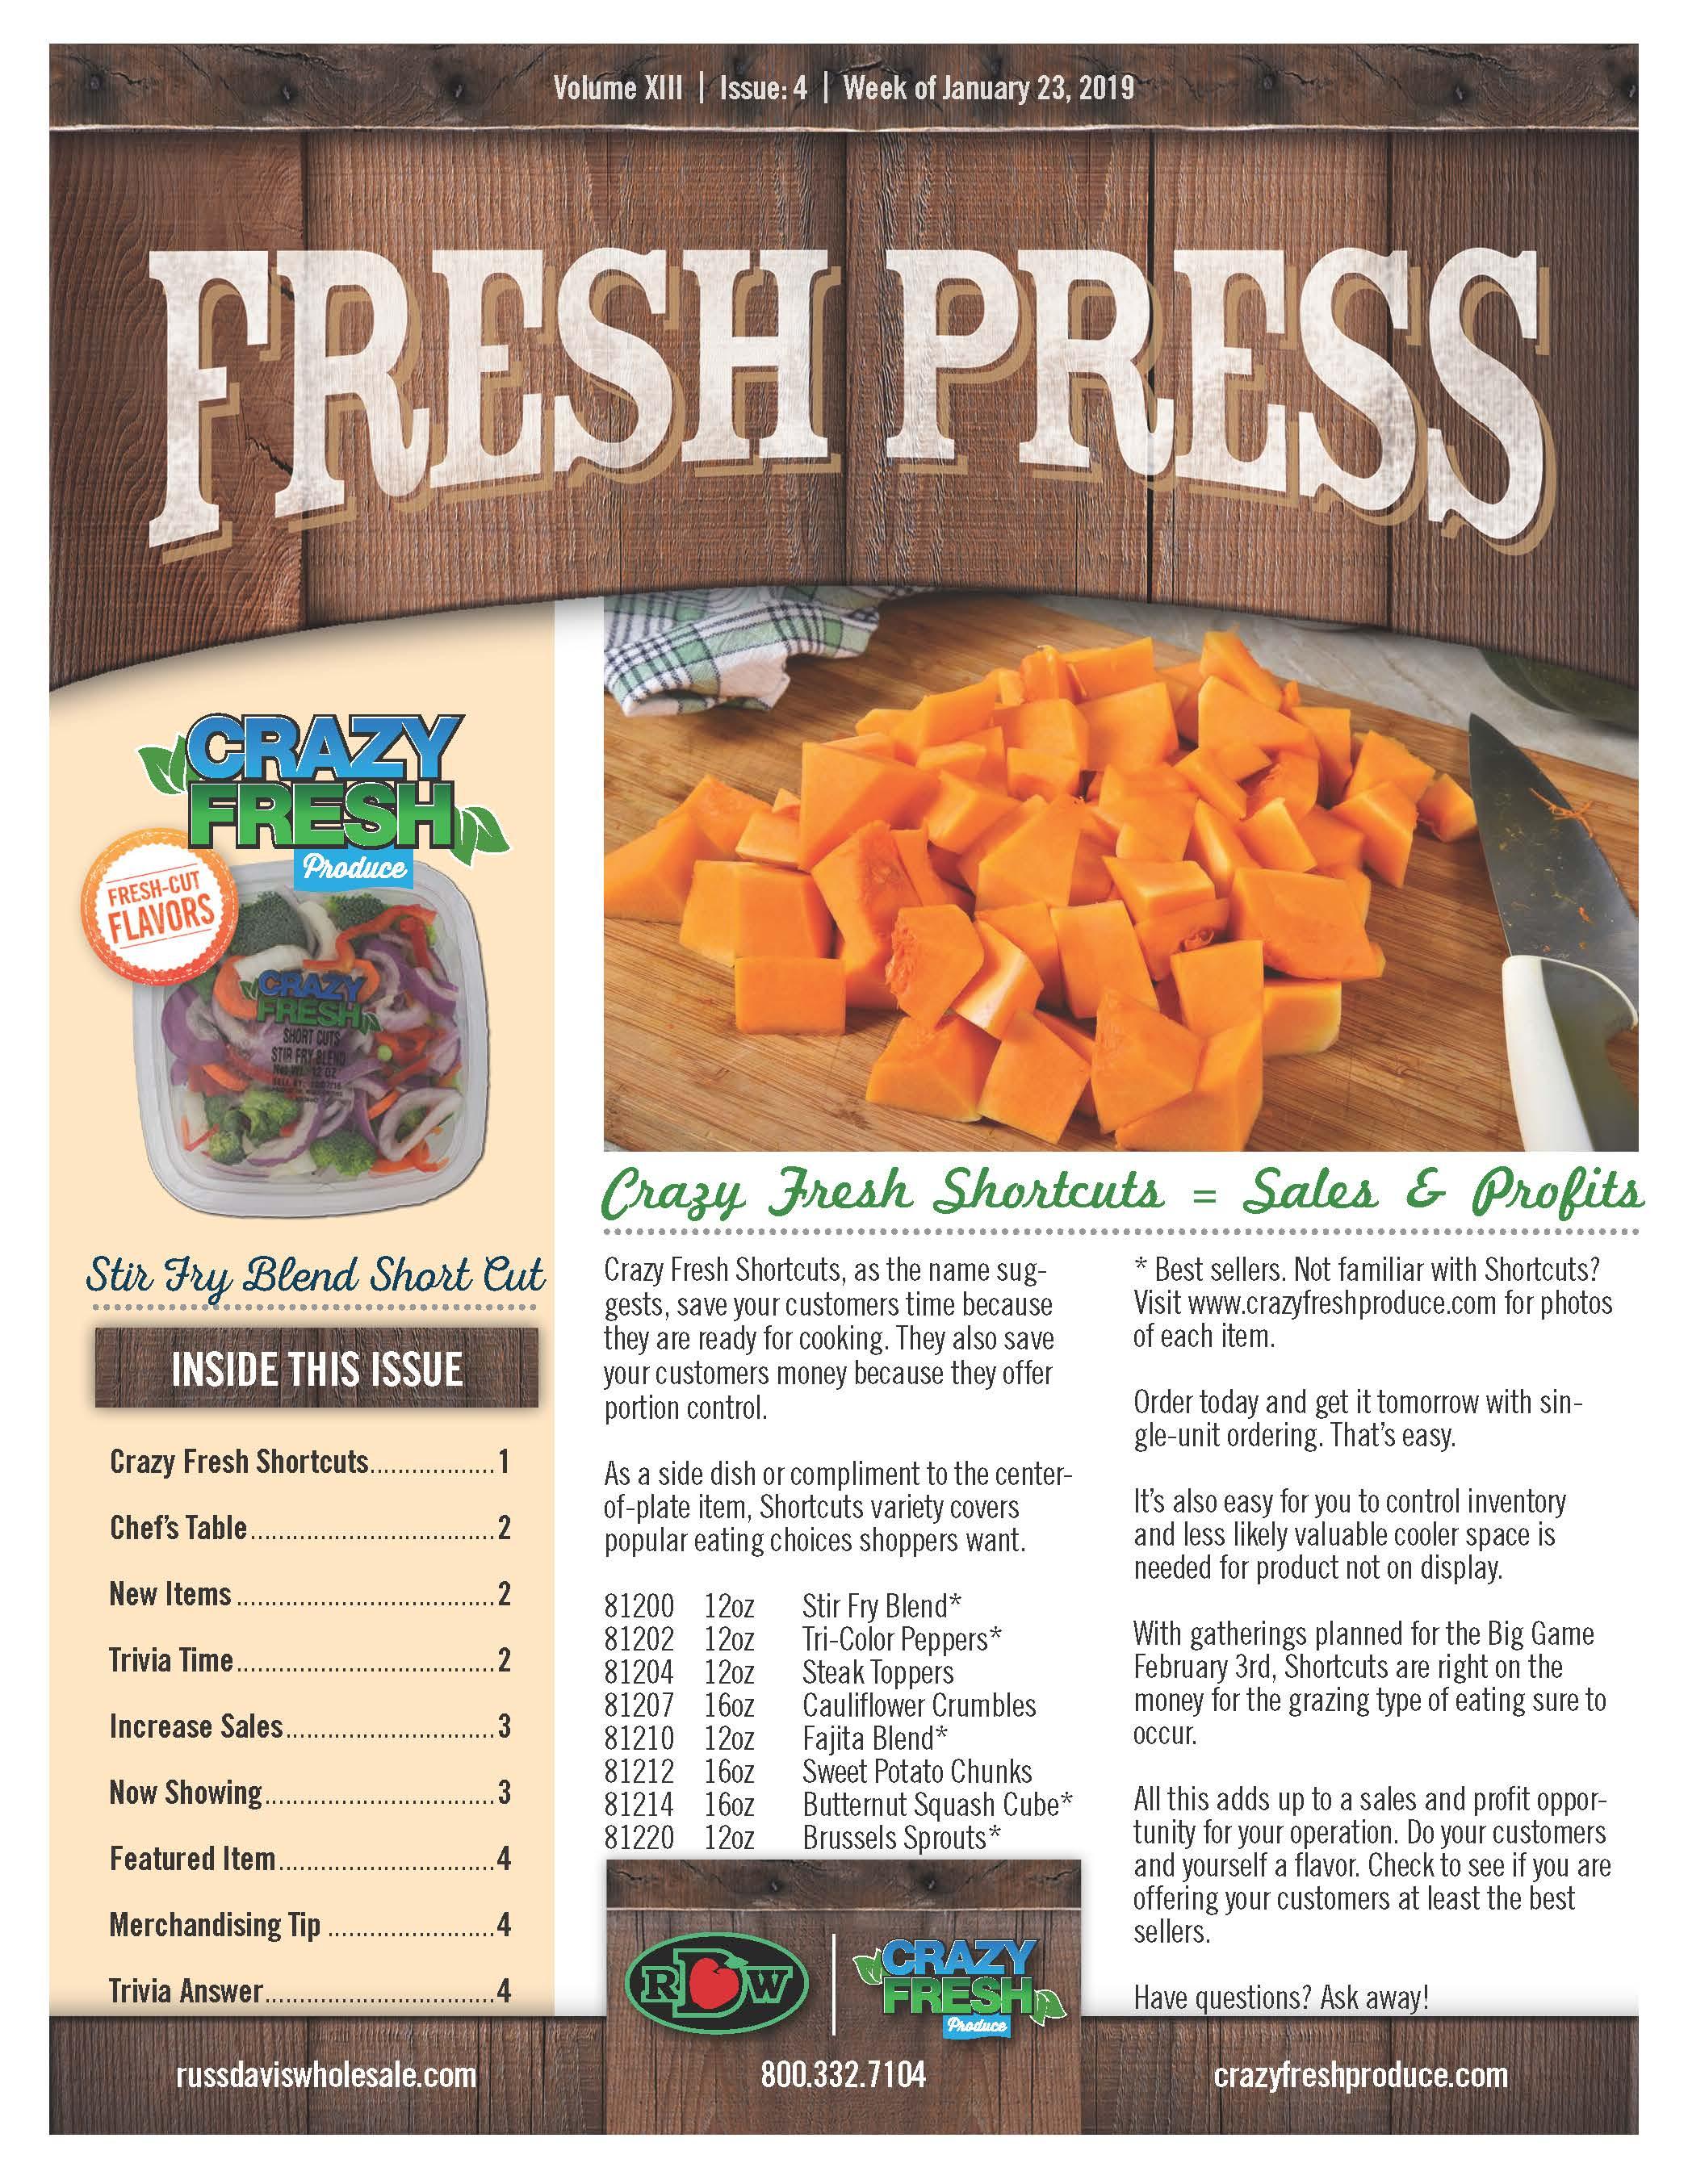 RDW_Fresh_Press_Jan23_2019_Page_1.jpg